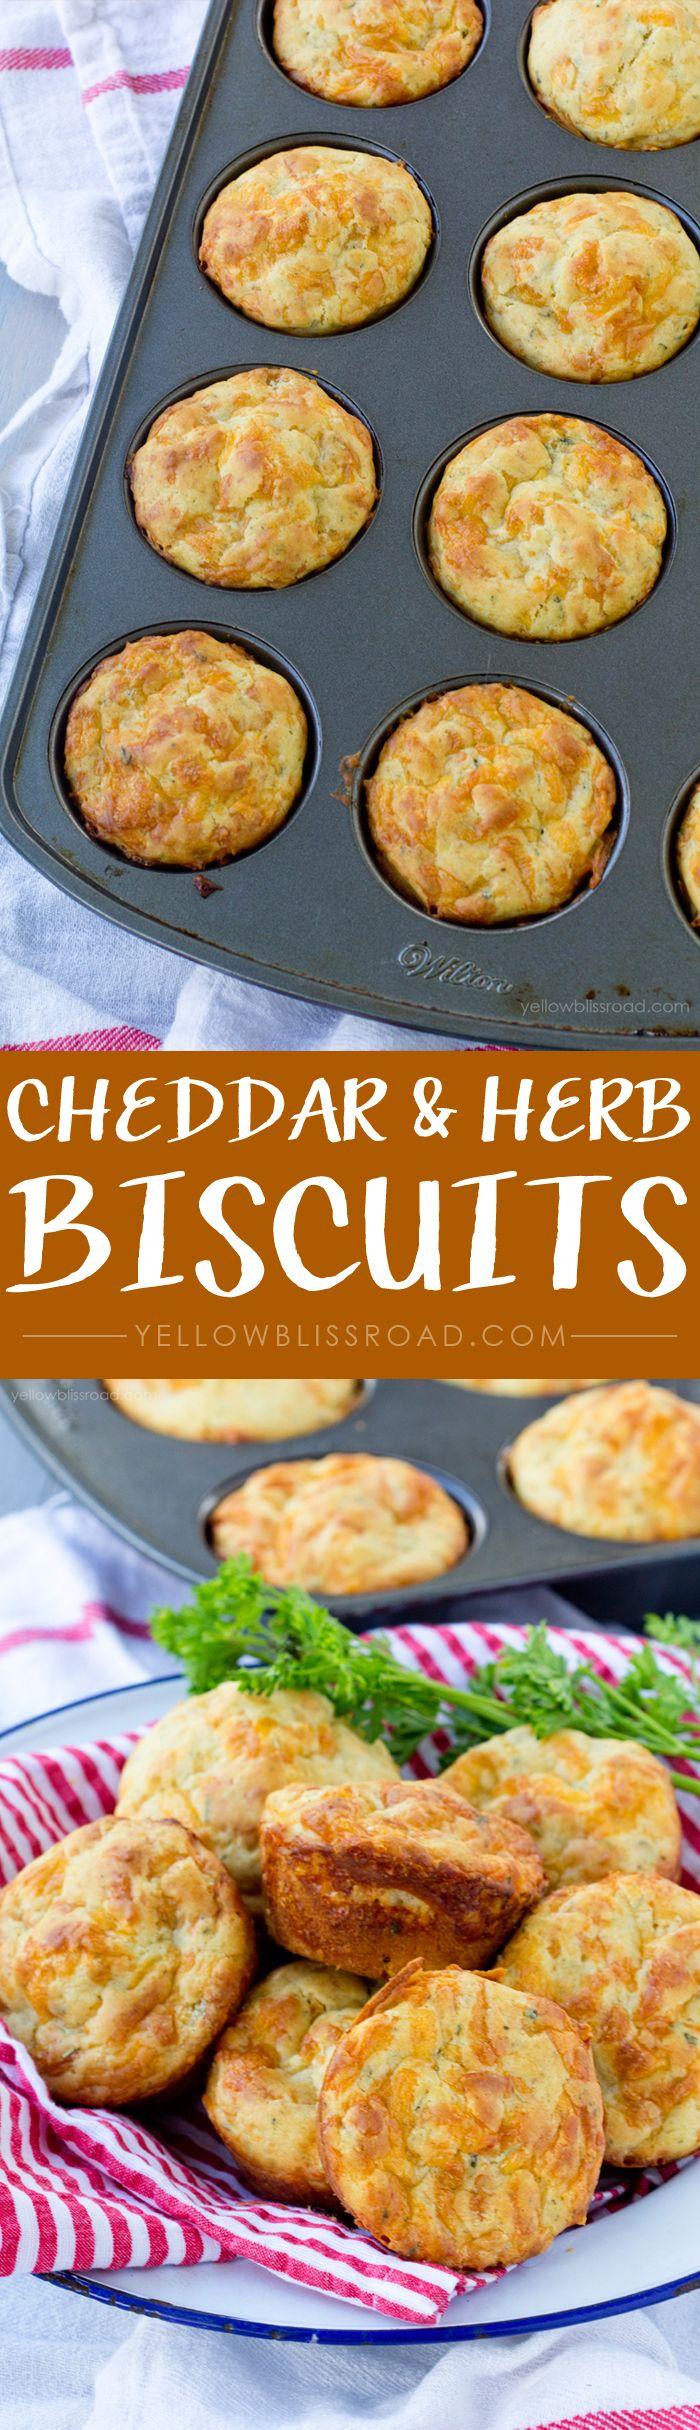 Cheddar & Herb Biscuits